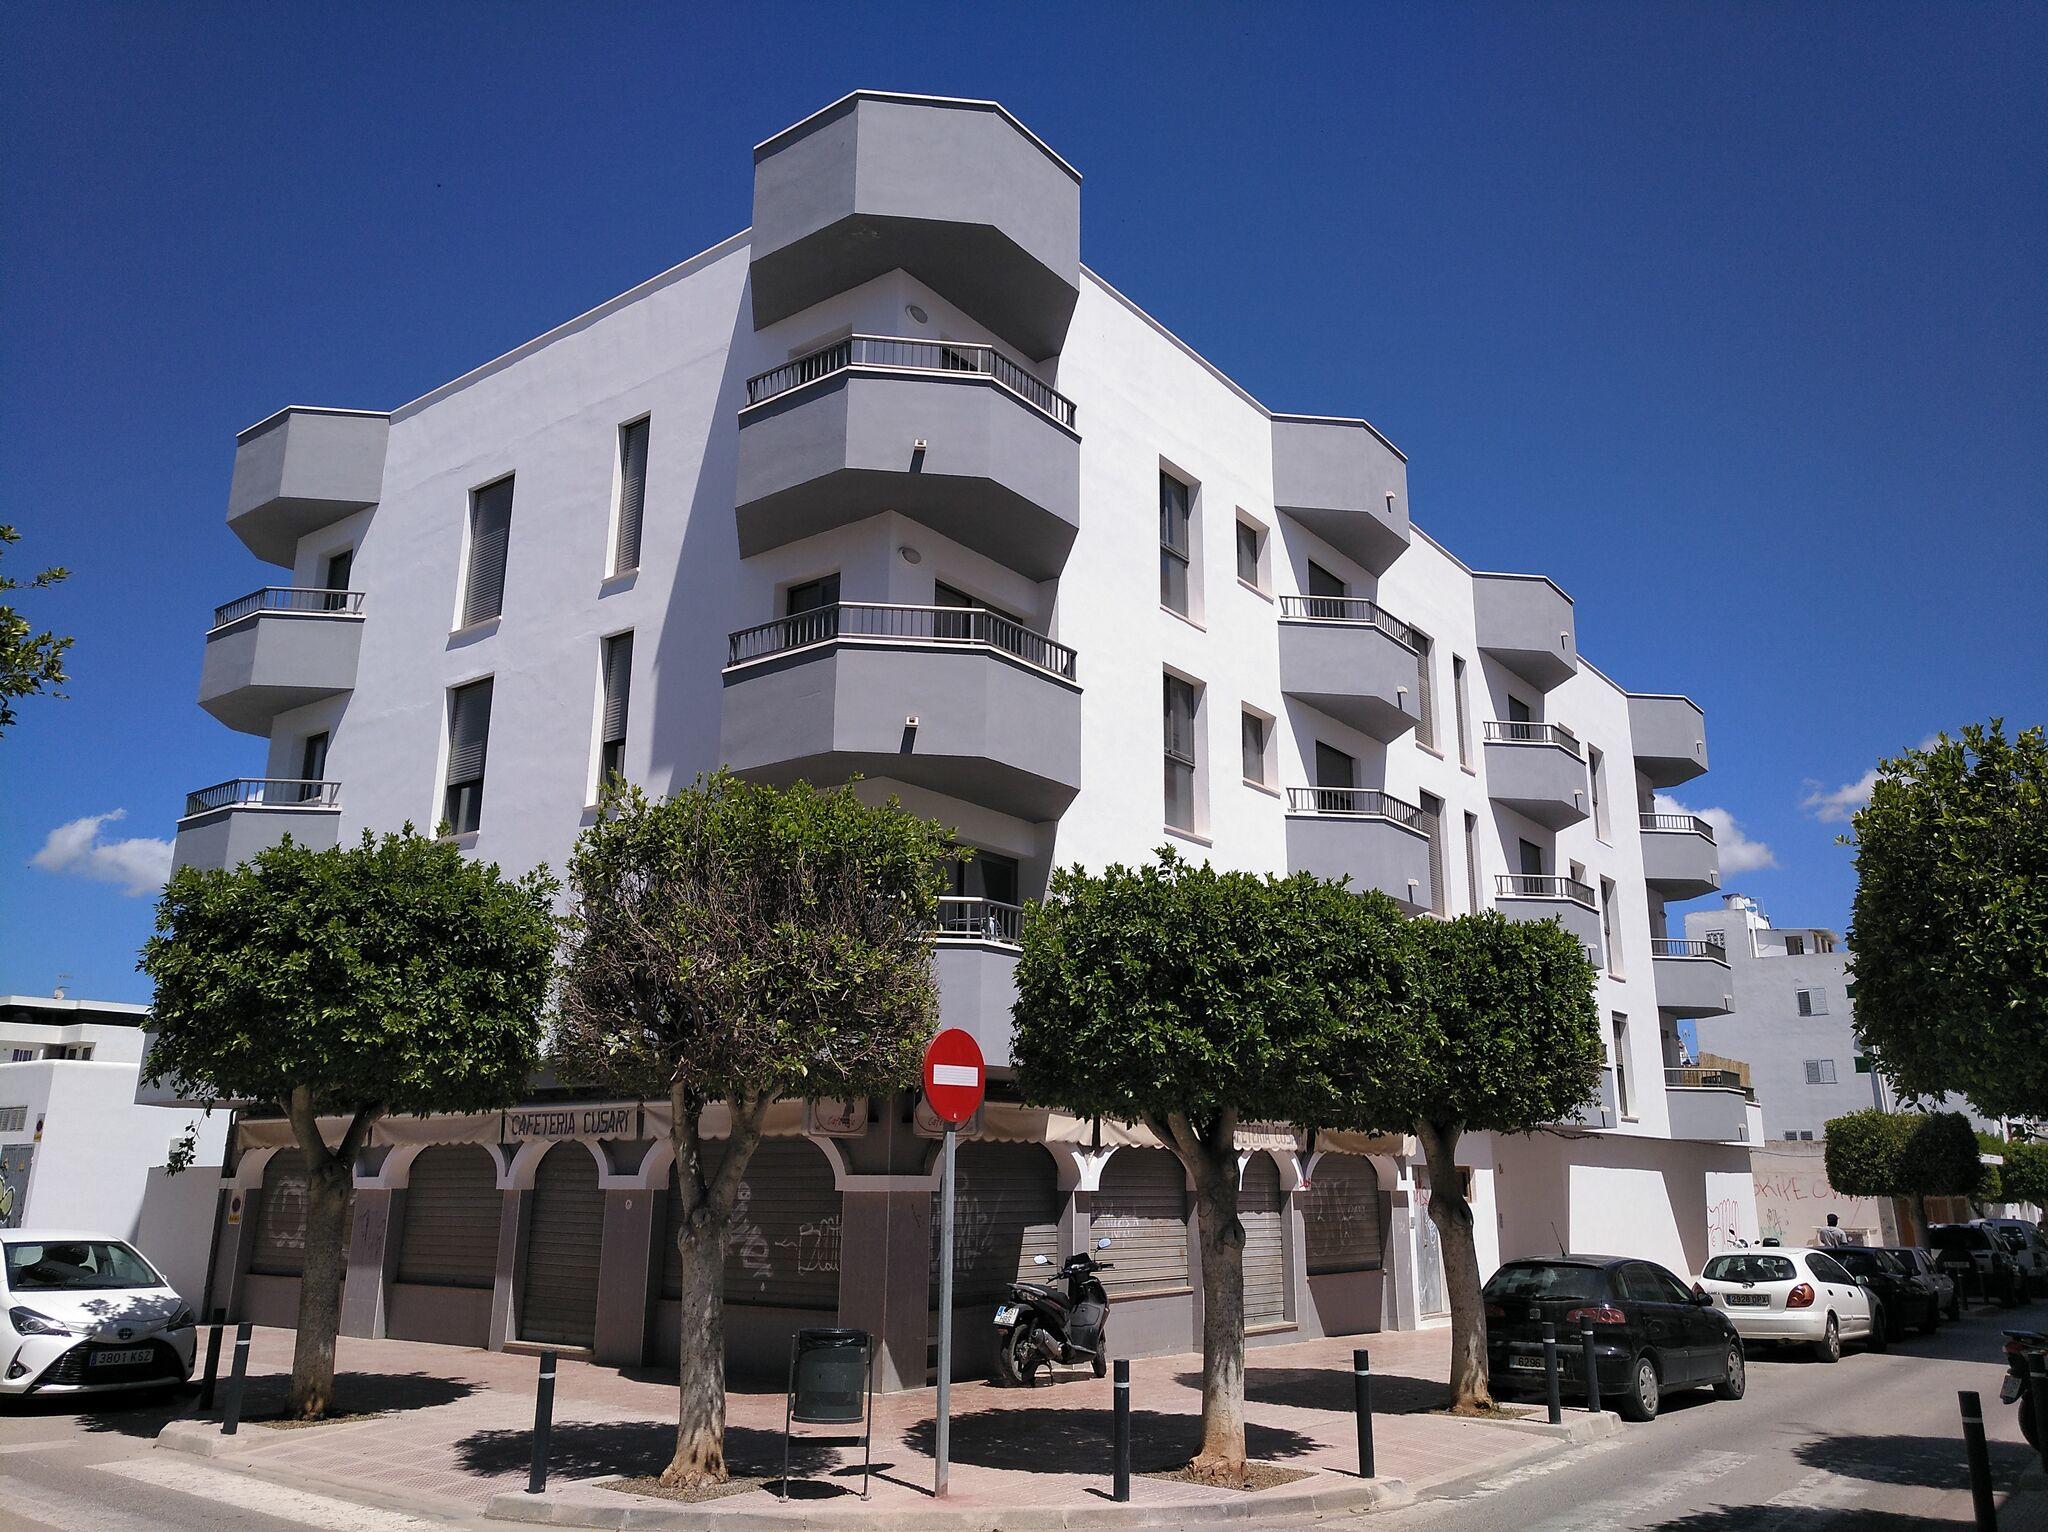 SEguro Decenal Edificio Viviendas Ibiza